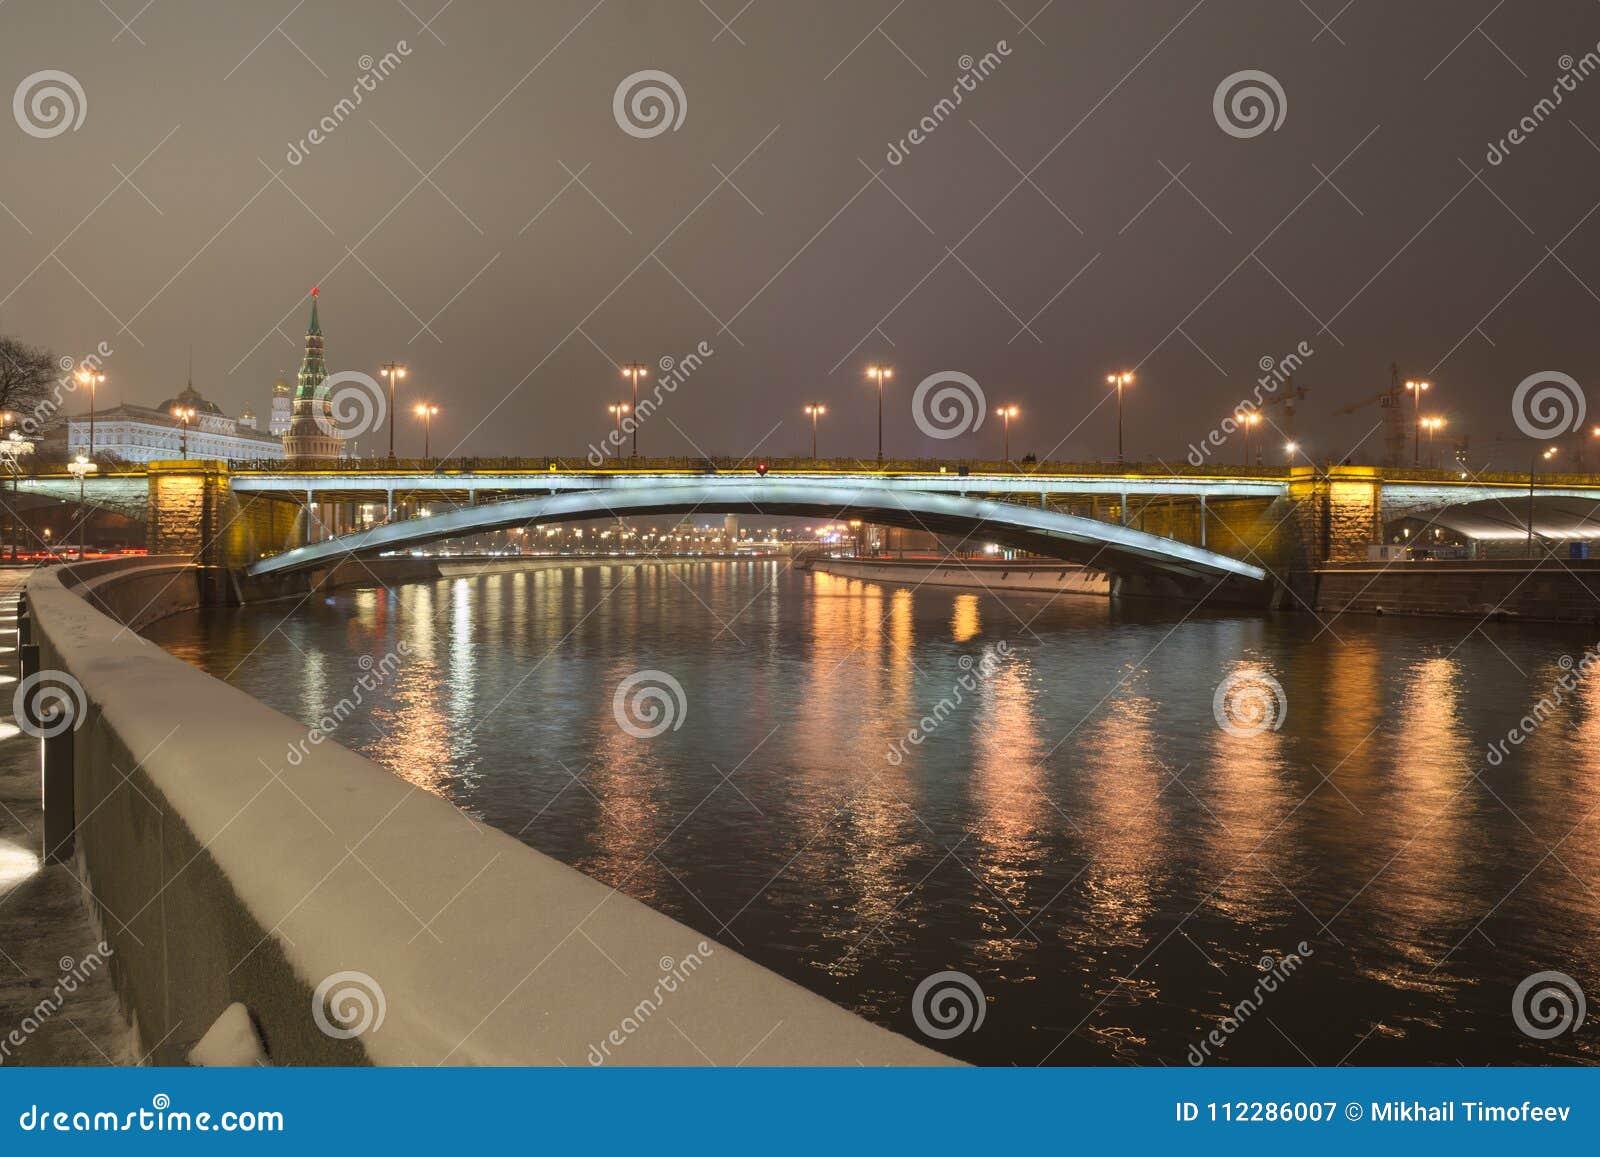 Bolshoy Kamenny Bridge Greater Stone Bridge at night.